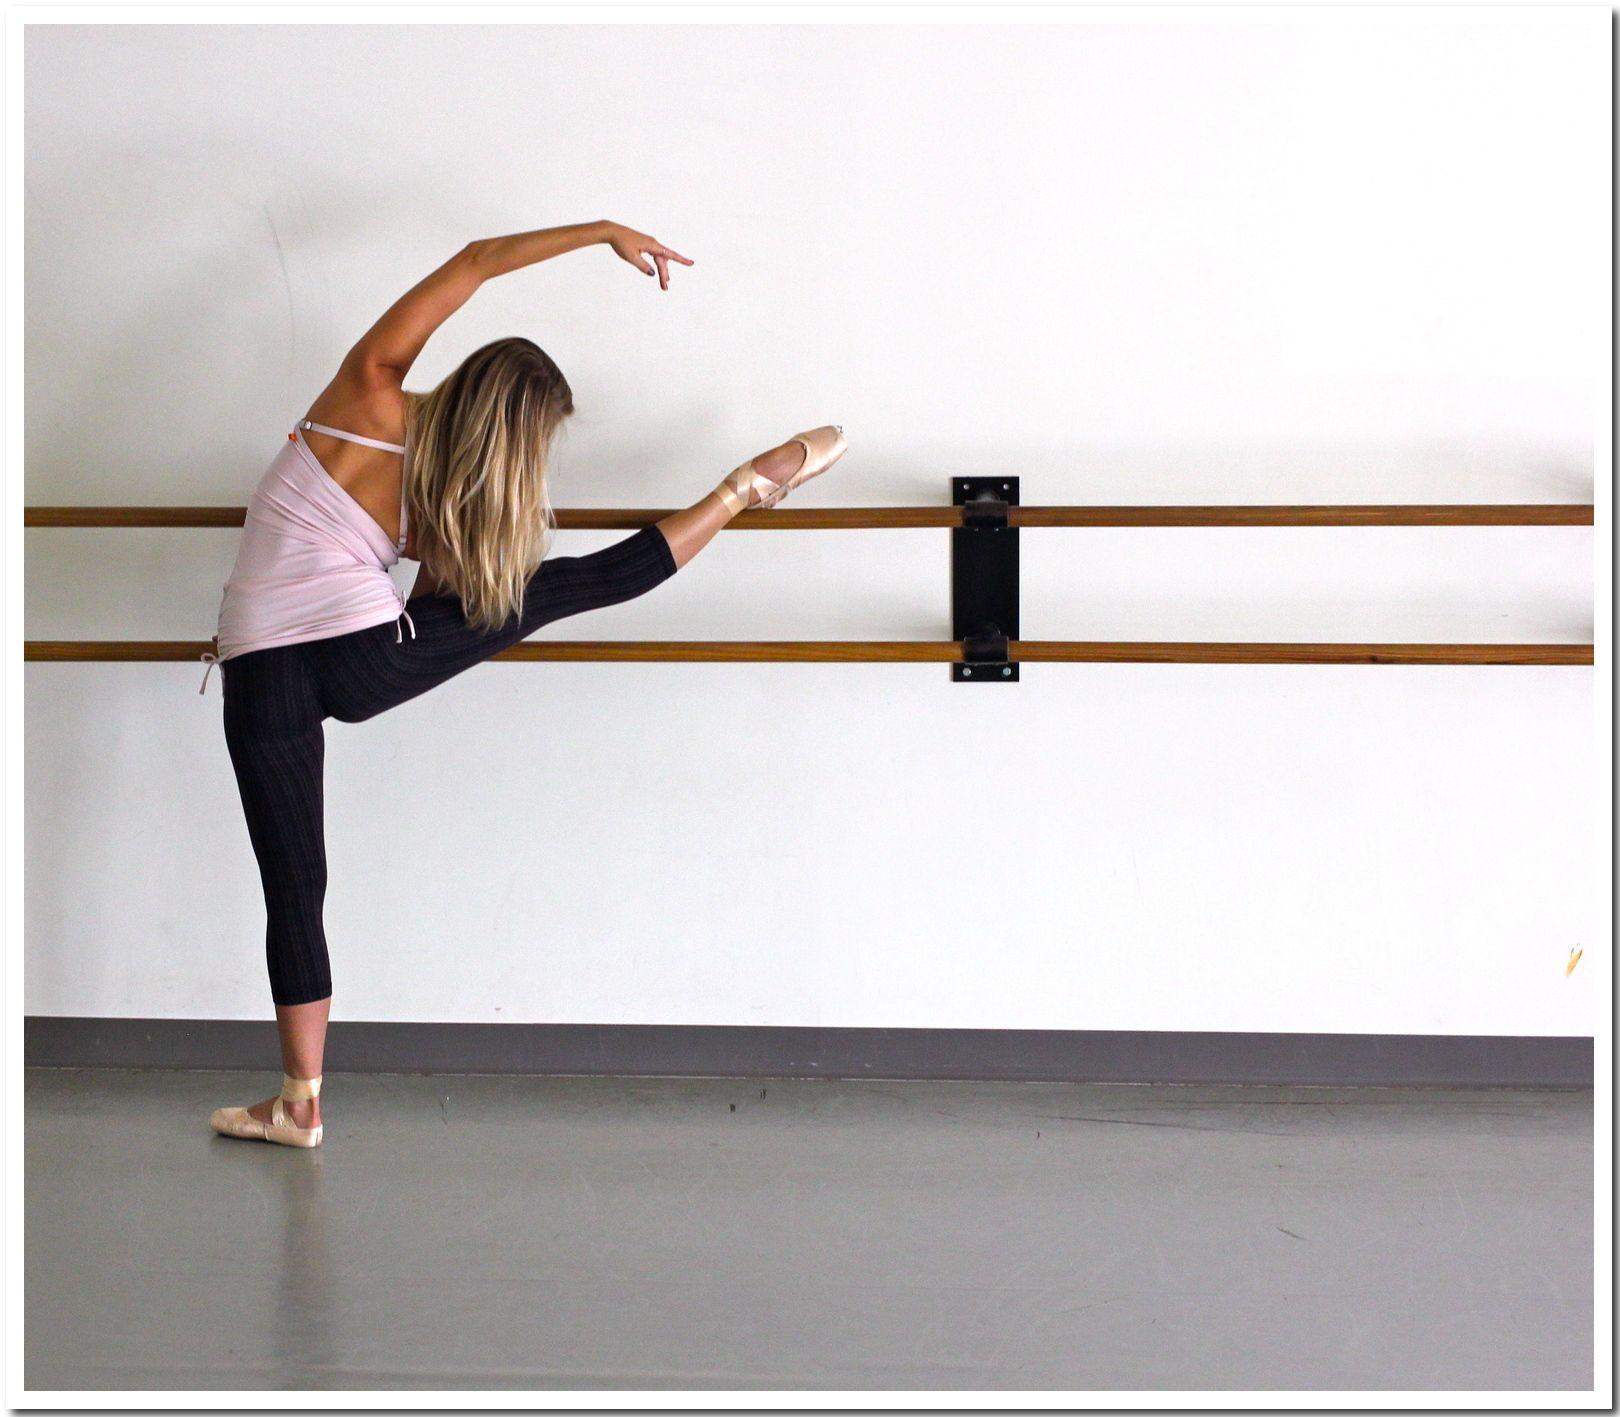 At the ballet barre professional ballerina kirsten evans